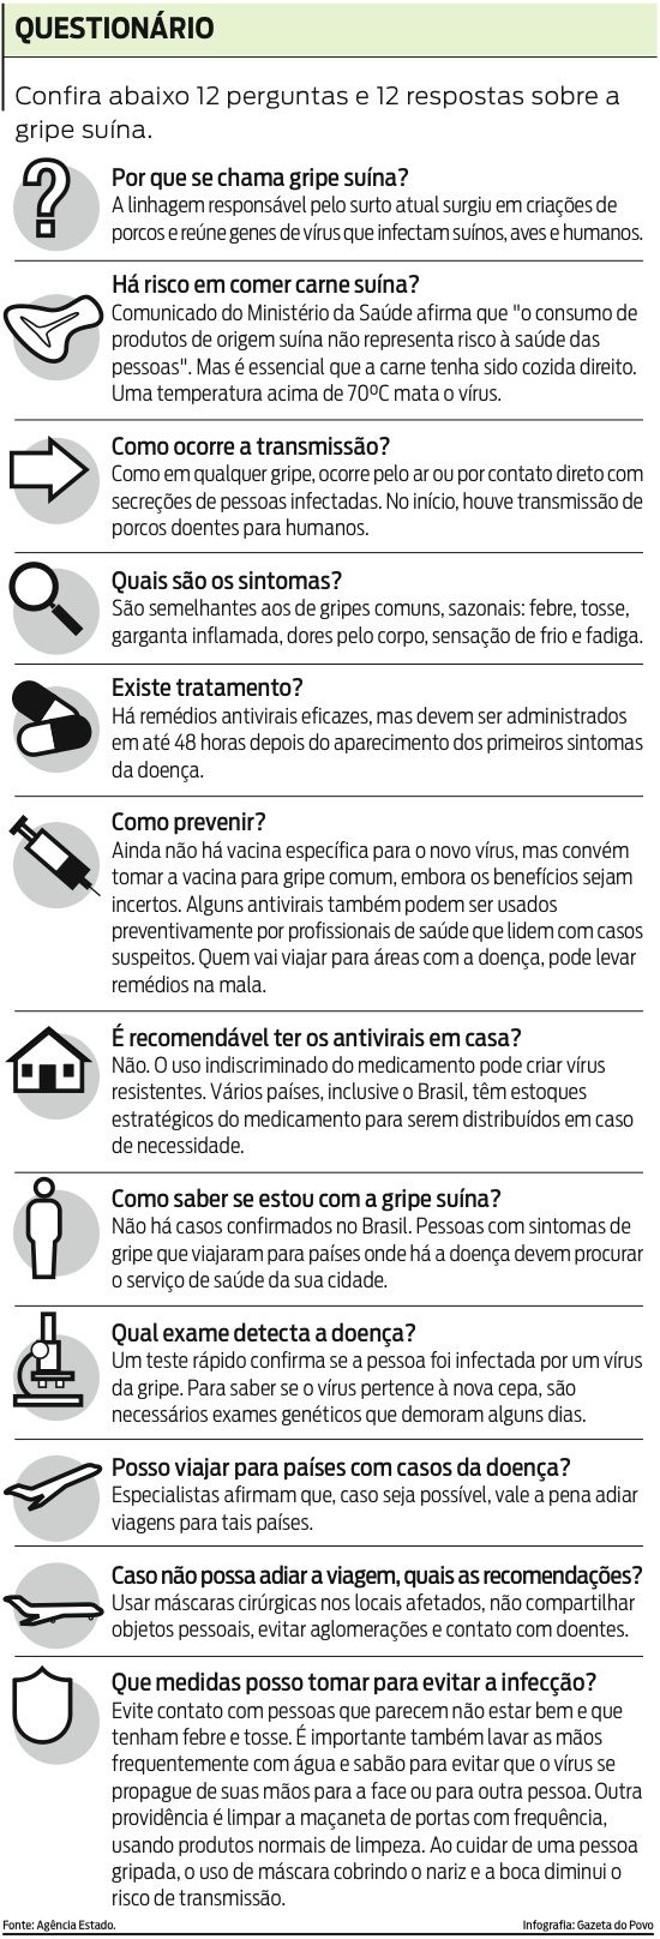 Confira perguntas e respostas da gripe suína  